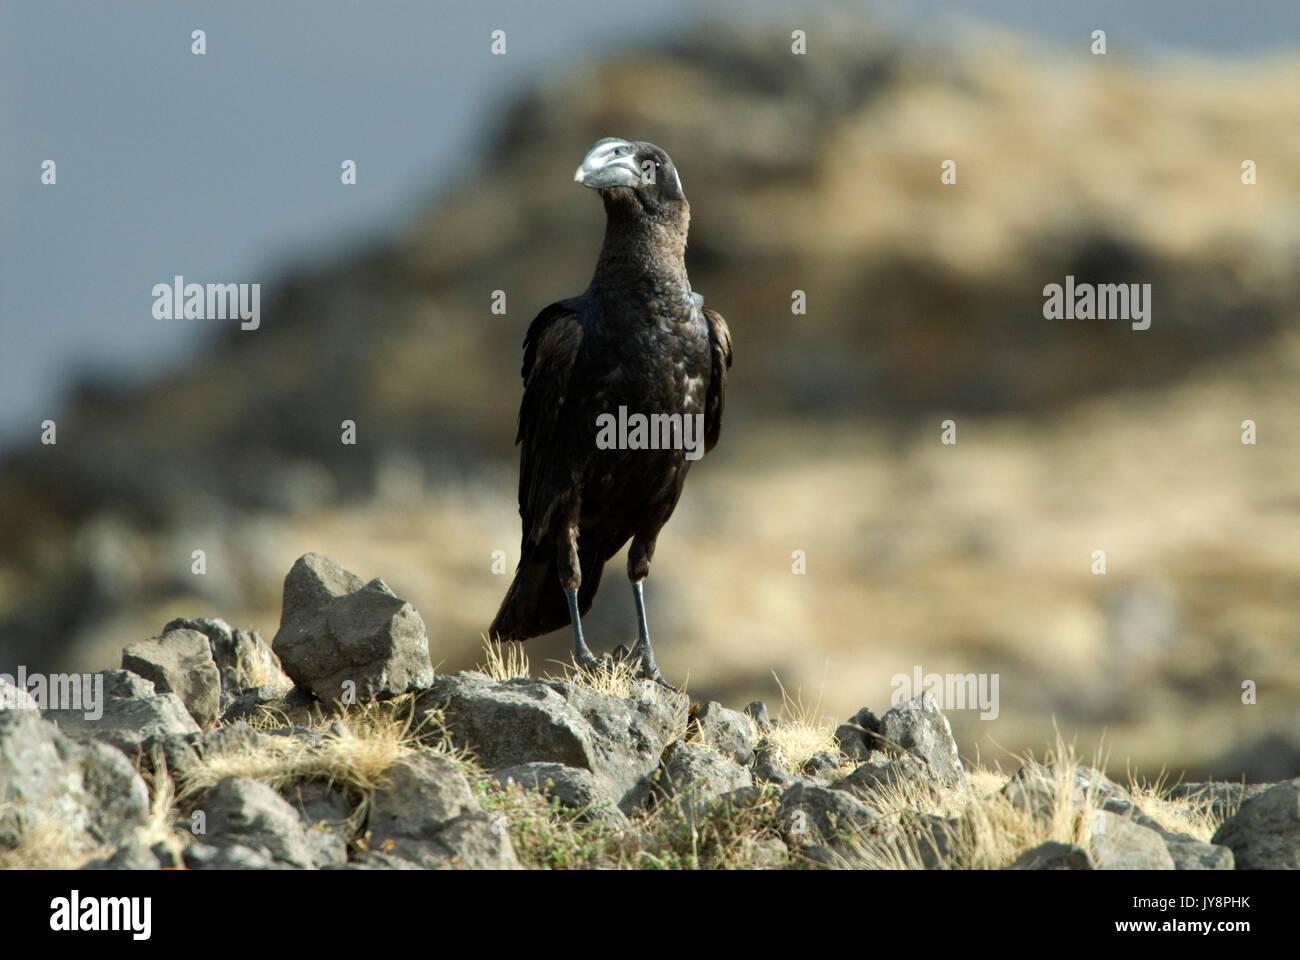 Thick Billed Raven, Corvus crassirostris, Simien Mountains National Park, Ethiopia, - Stock Image